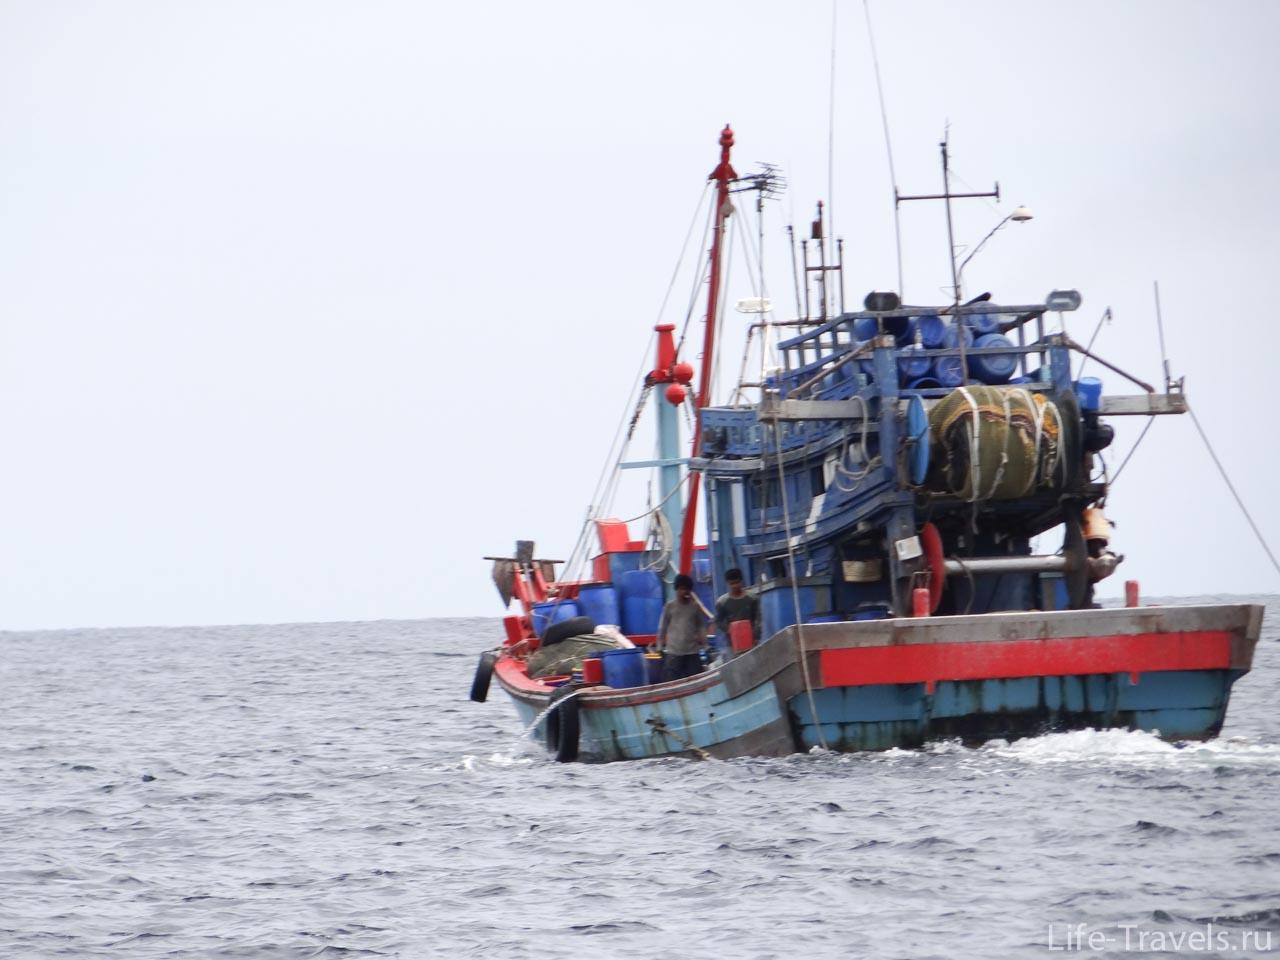 Koh Lipe fisherman